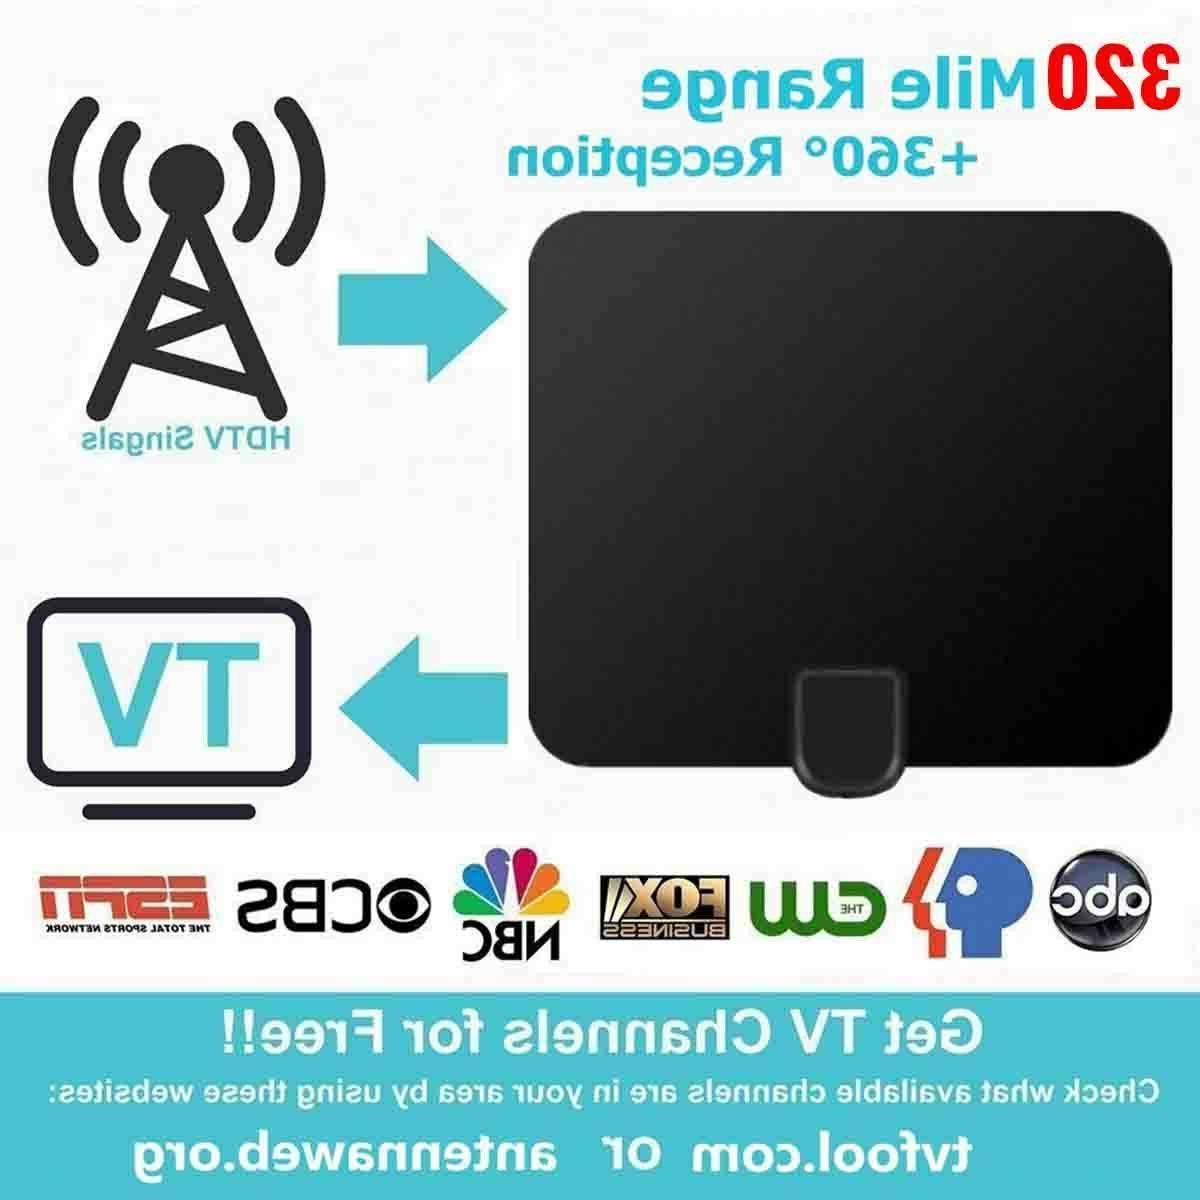 SUPER HDTV VHF MILES INDOOR